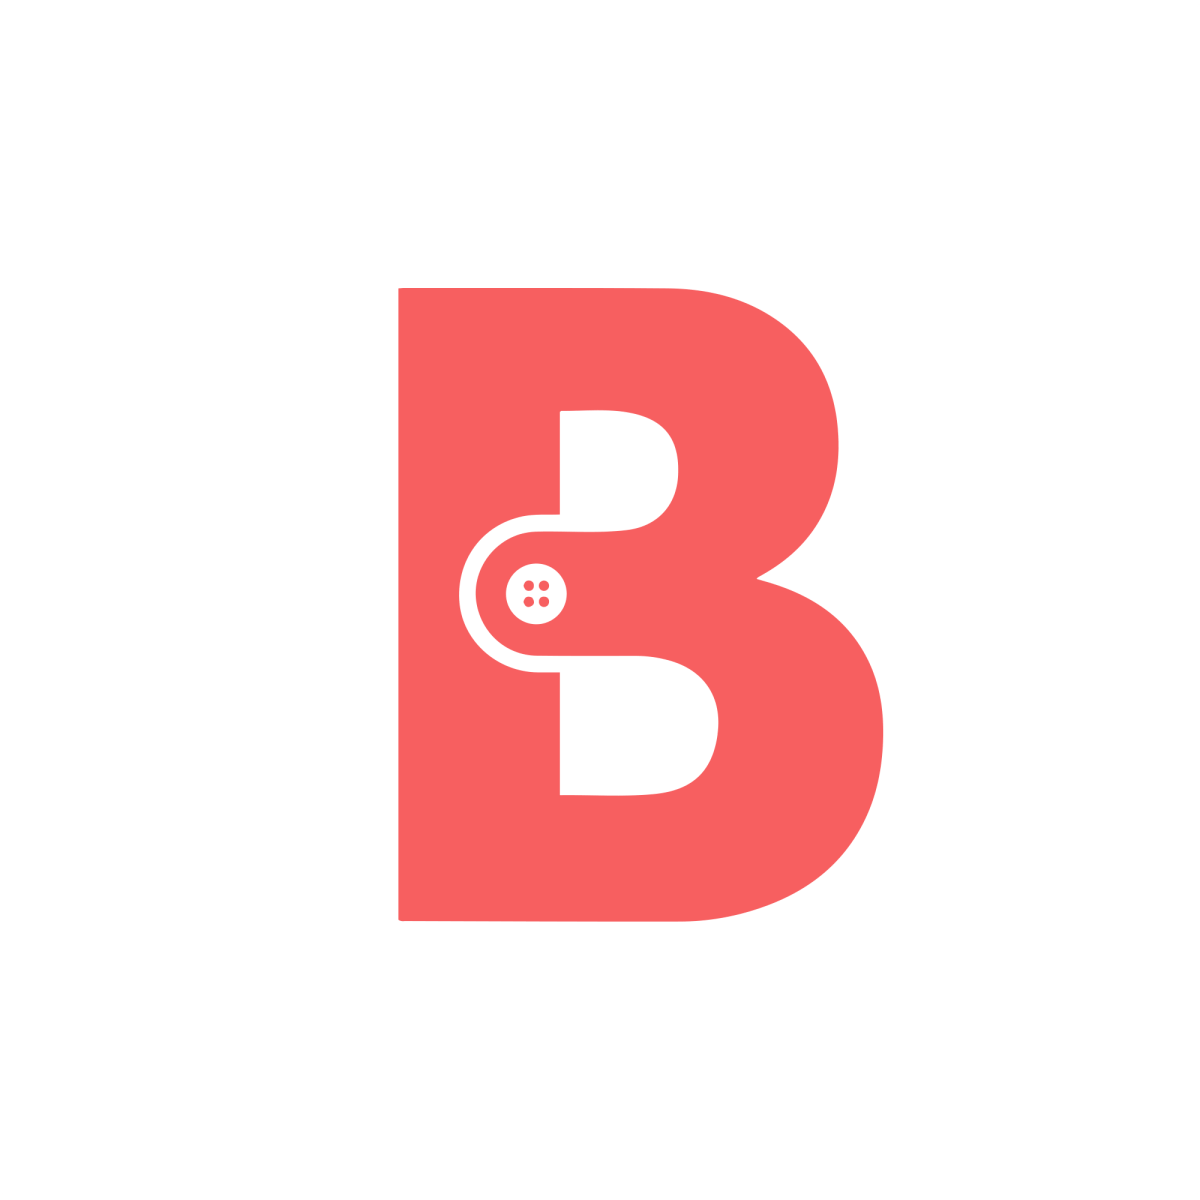 Bundle Bags Logo Australia Bags Logo Single Letter Logo Letter Logo